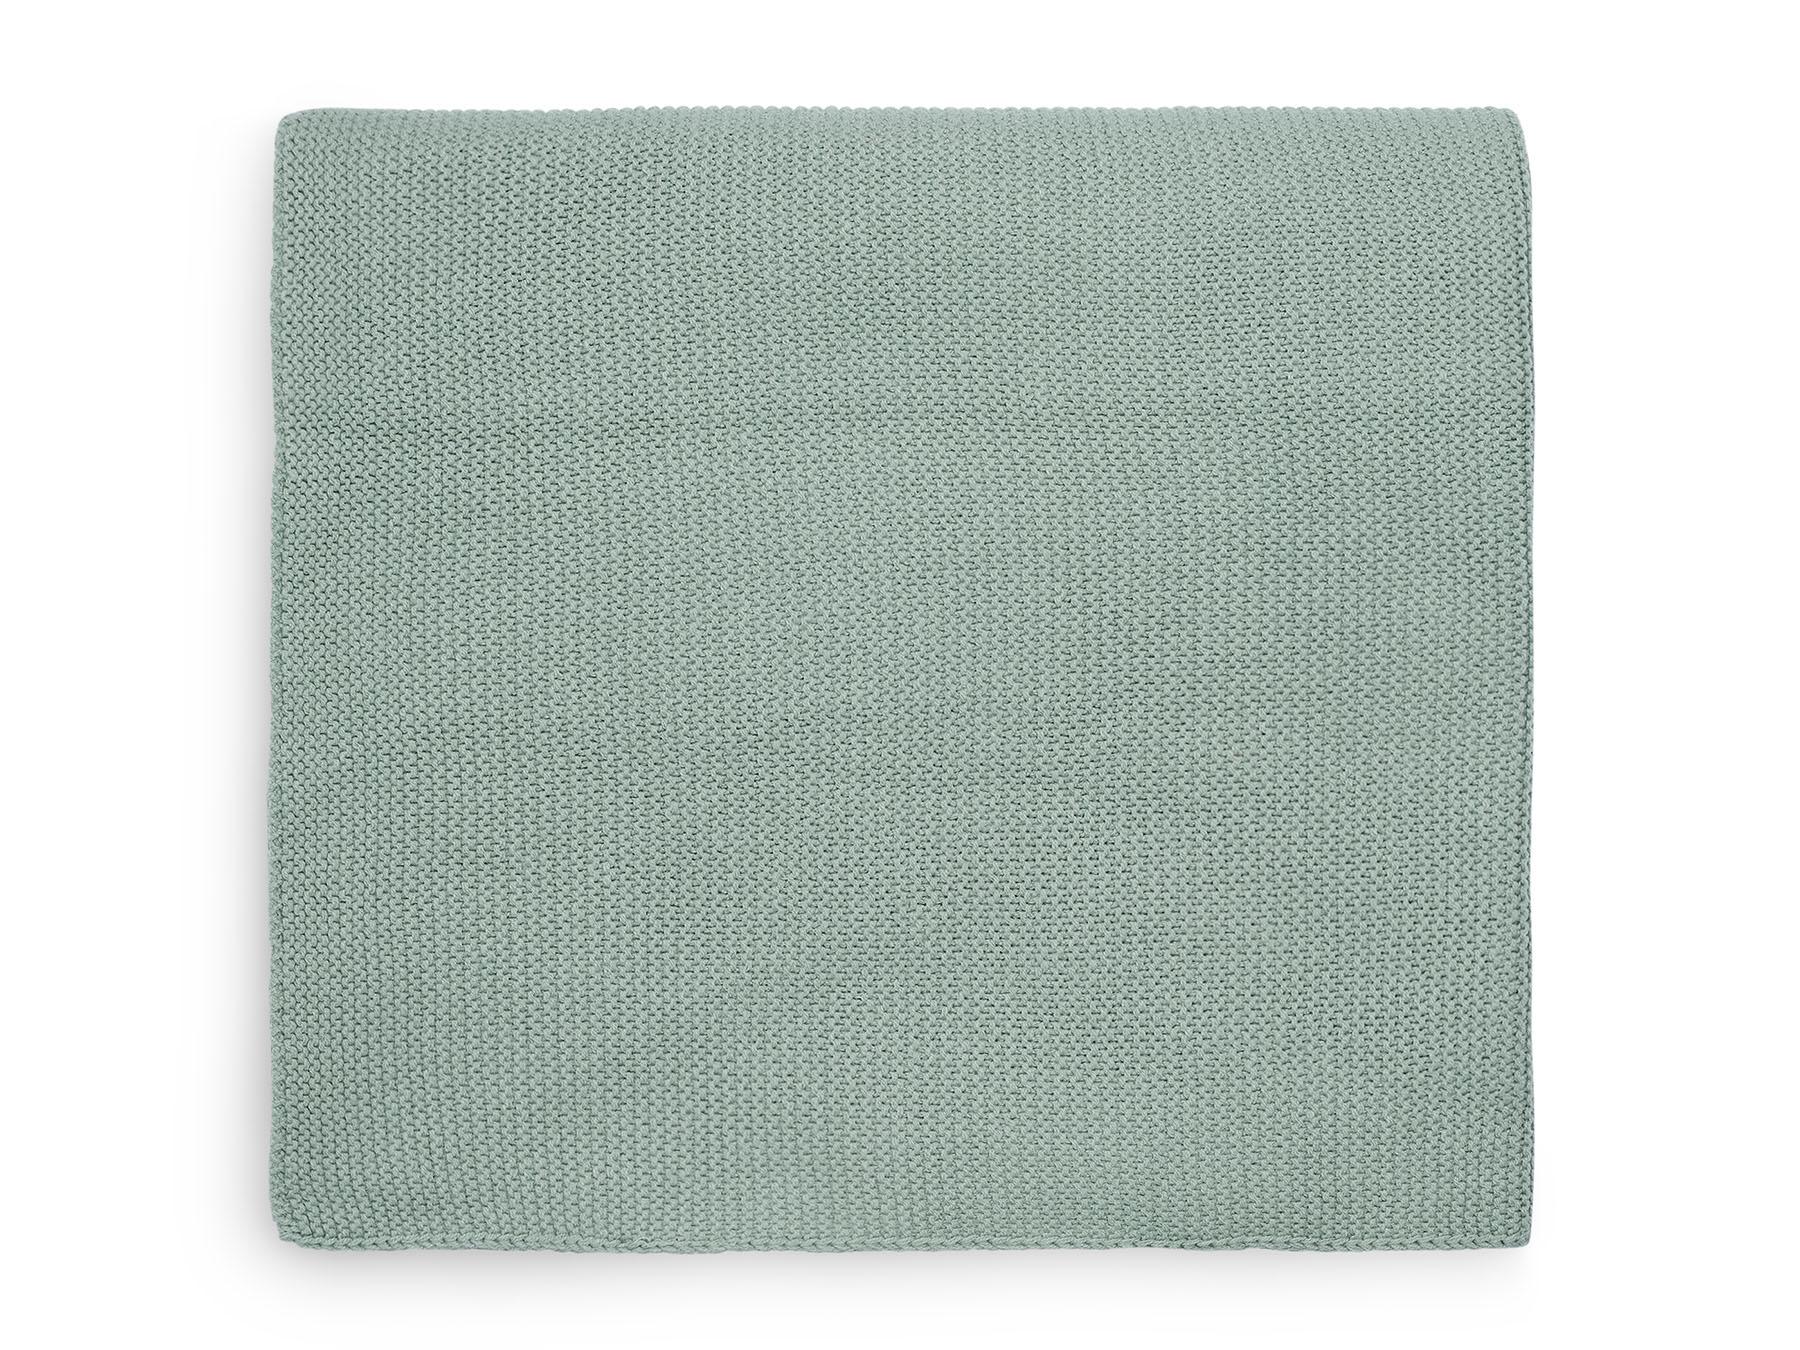 Babydecke Strickdecke Basic Knit stone green (75x100 cm)